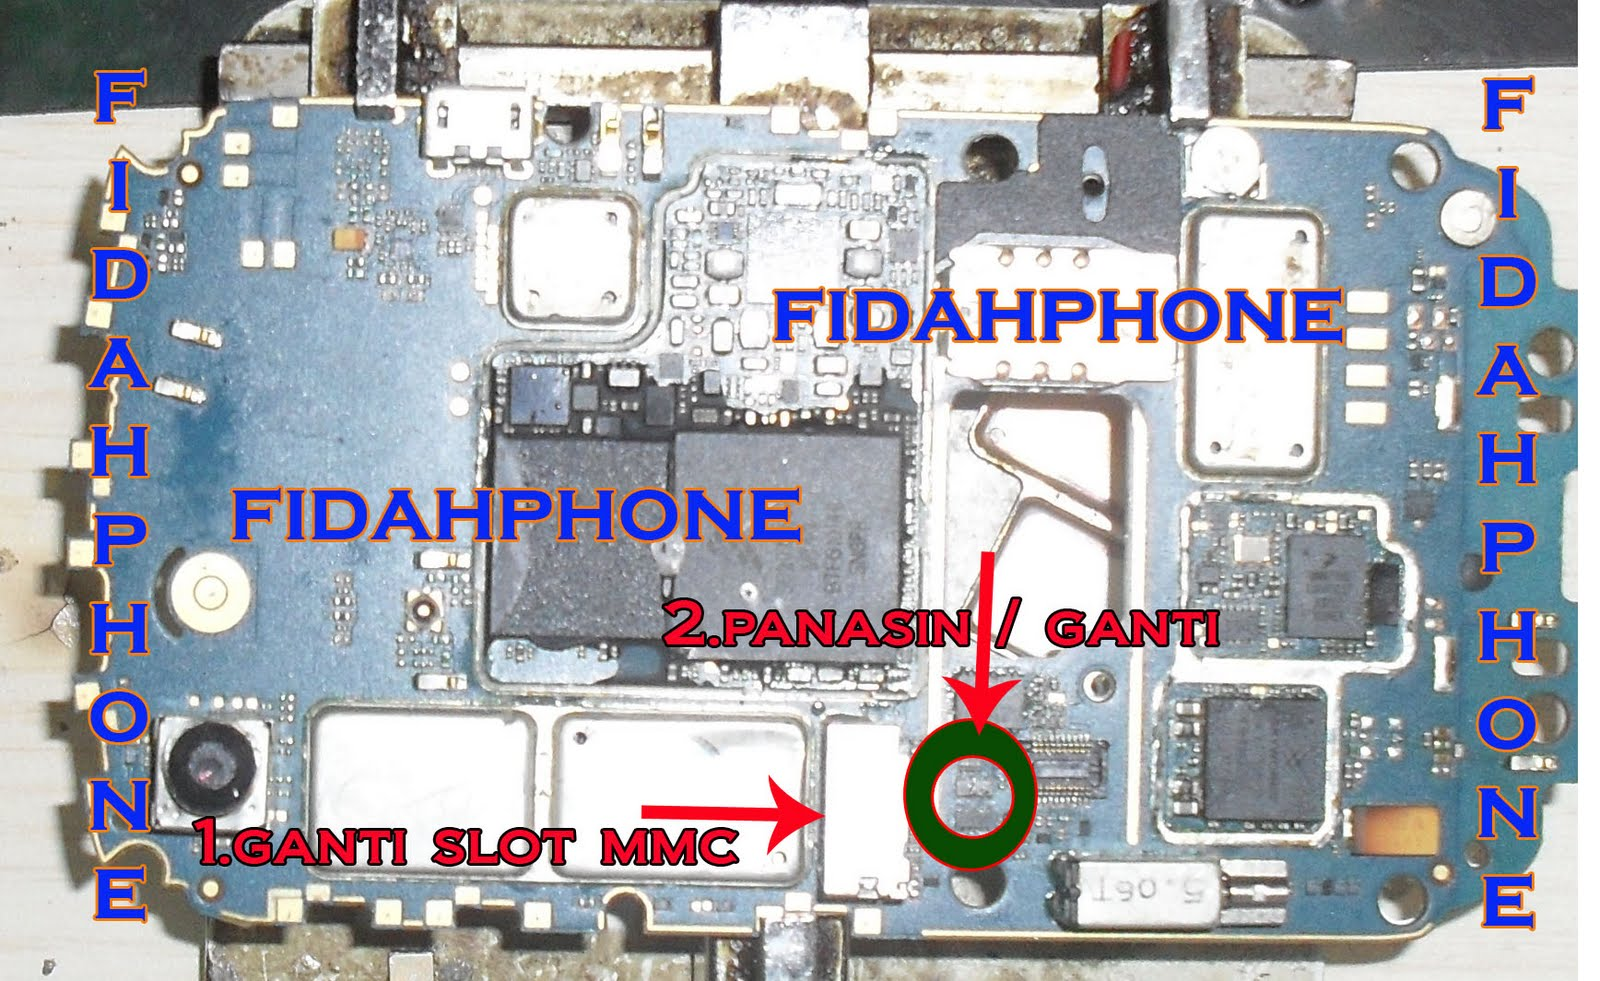 Bersama Fidahpone Blackberry Tidak Bisa Baca Mmc Fatal Error